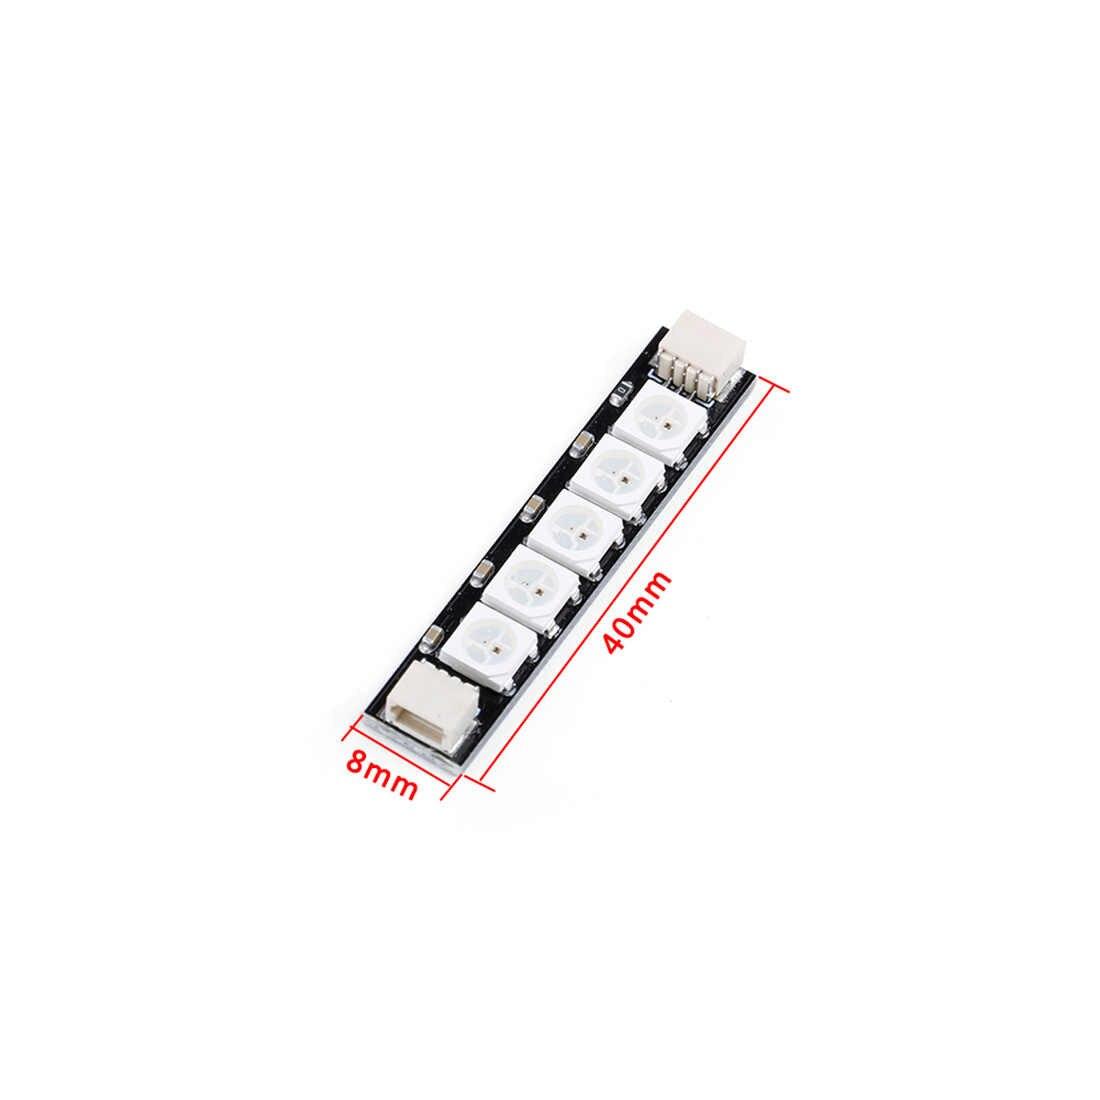 4 Pcs Iflight Programmable RGB 5 Lampu LED 5V Super Lampu LED Ekor Lampu Papan PCB 3 Pin Plug untuk RC FPV Racing Drone